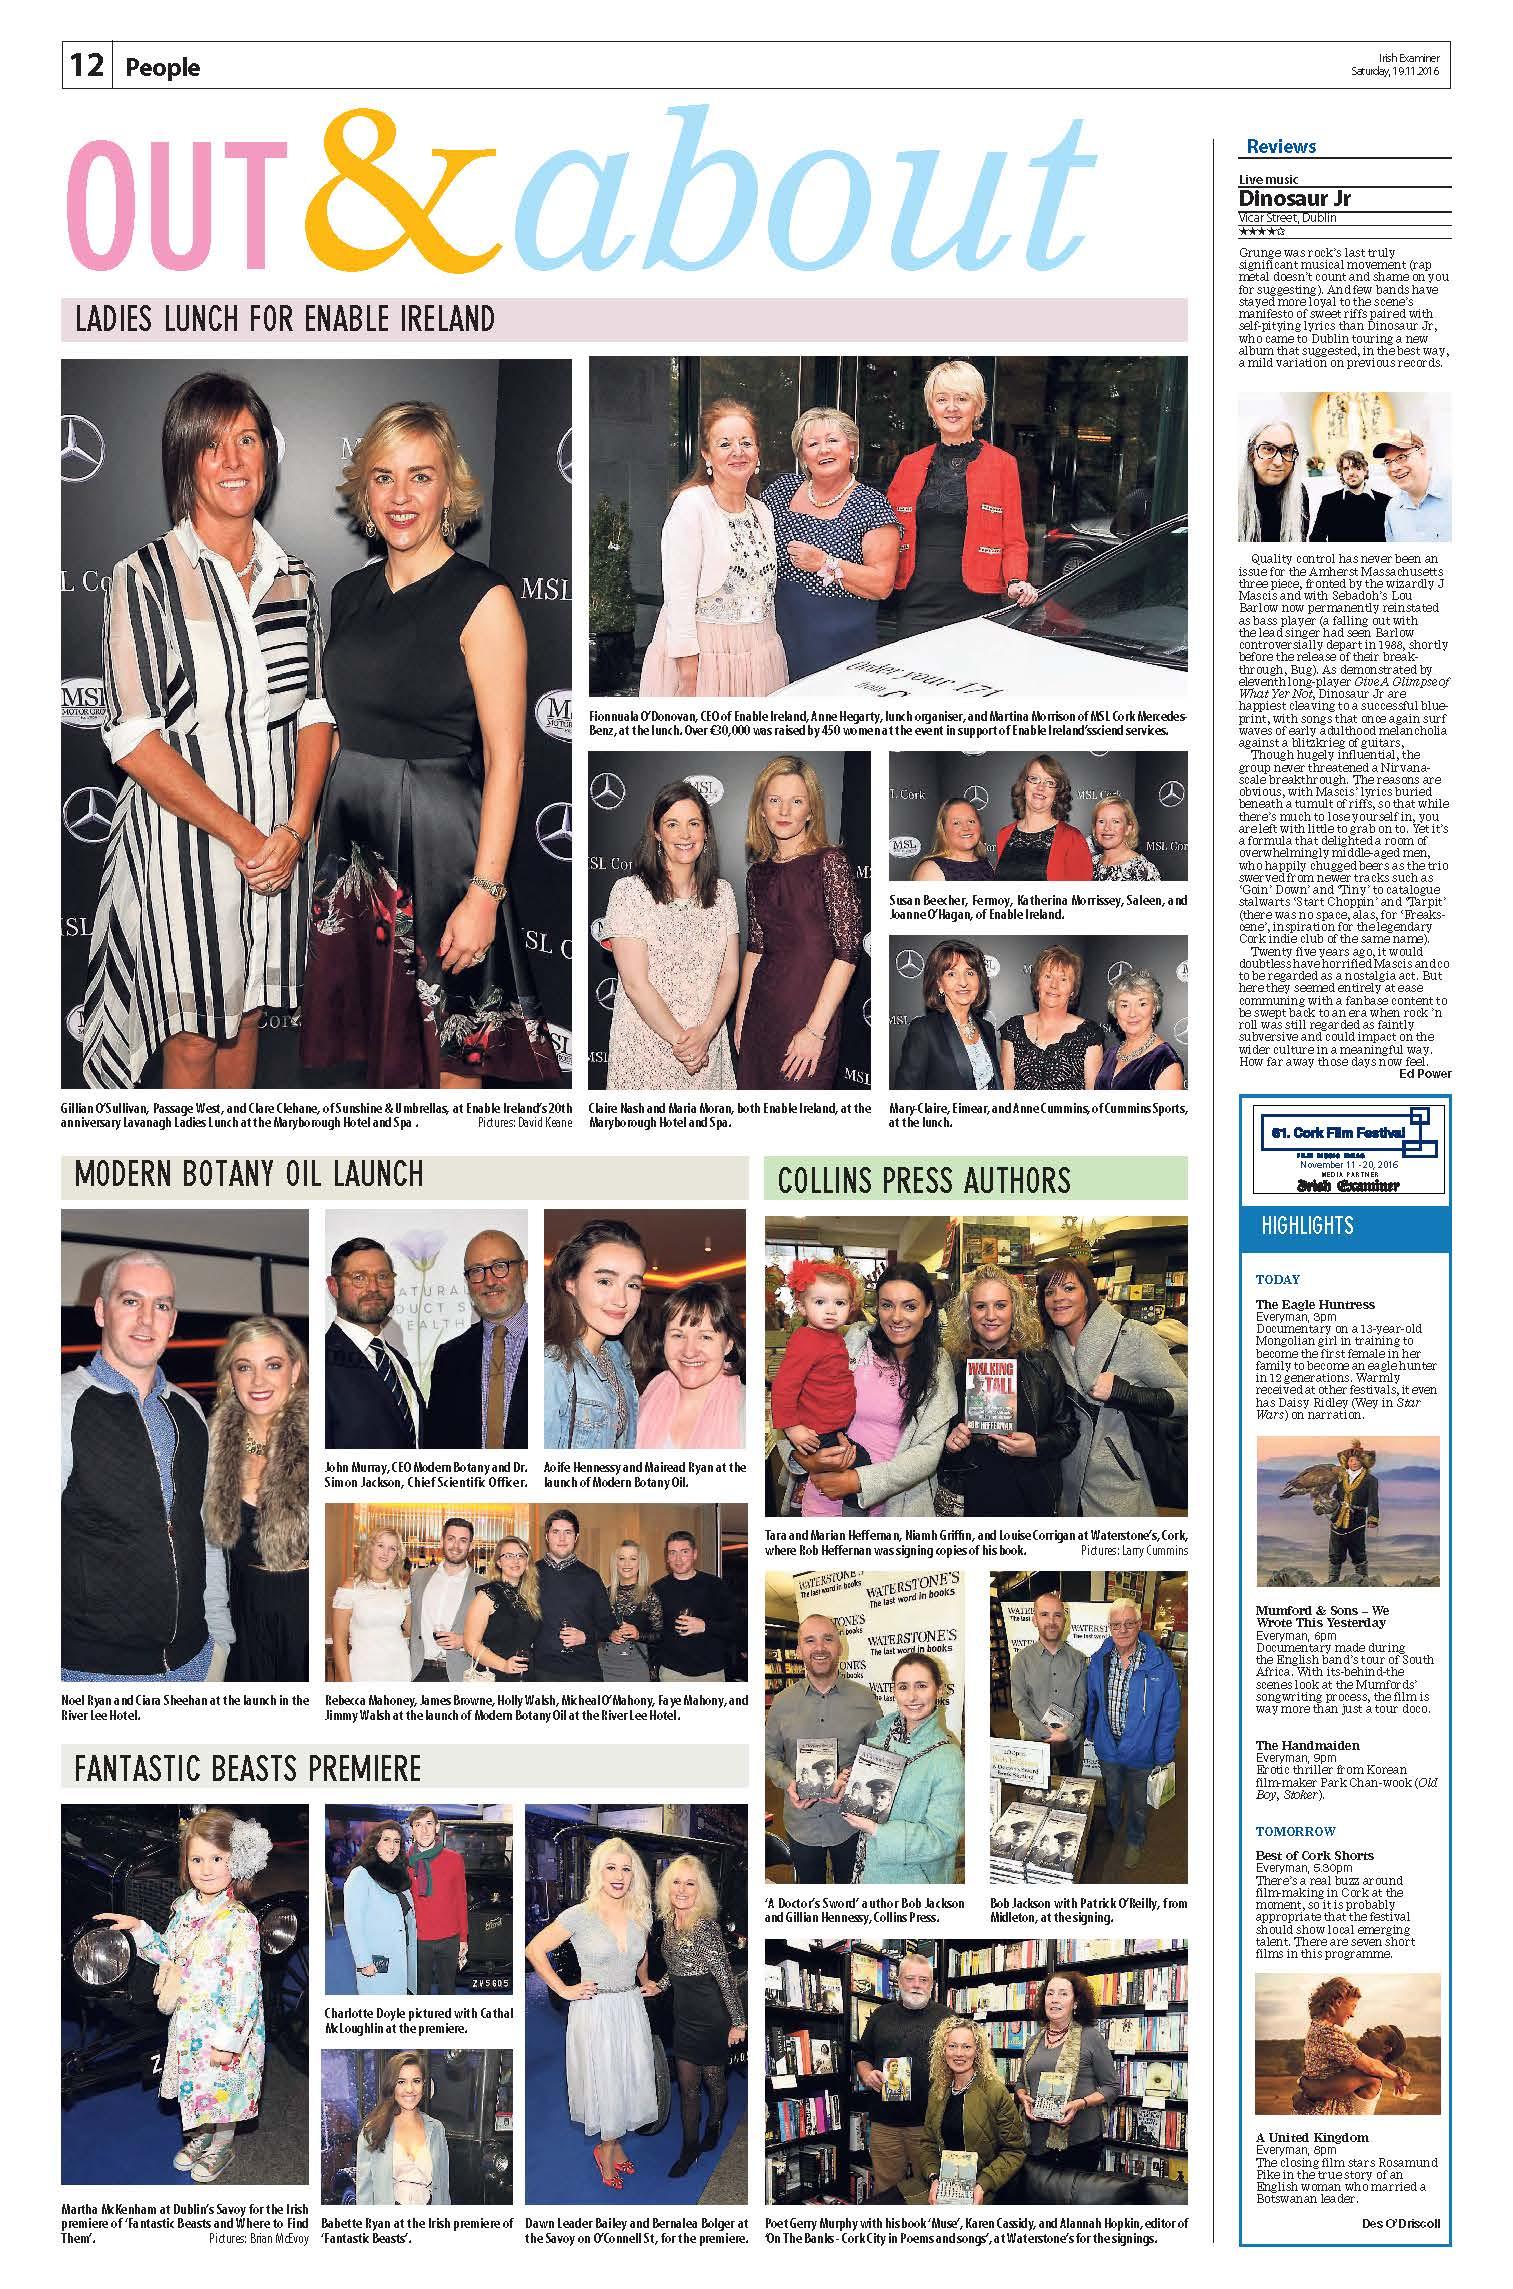 Irish Examiner Product Launch 2016